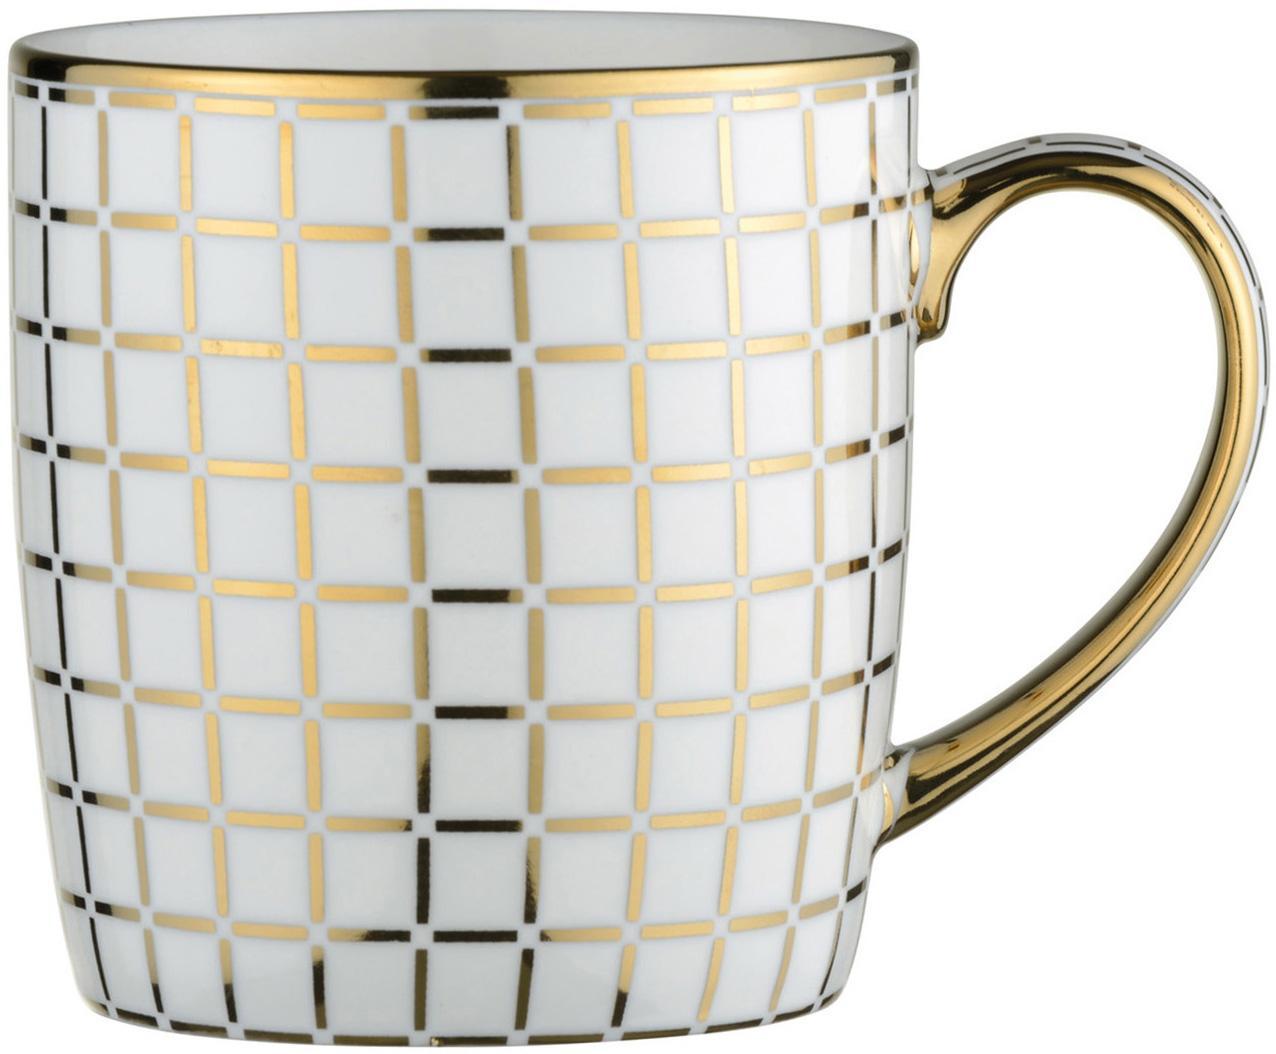 Mokken Lattice, 4 stuks, Porselein, Wit, goudkleurig, Ø 9 x H 10 cm